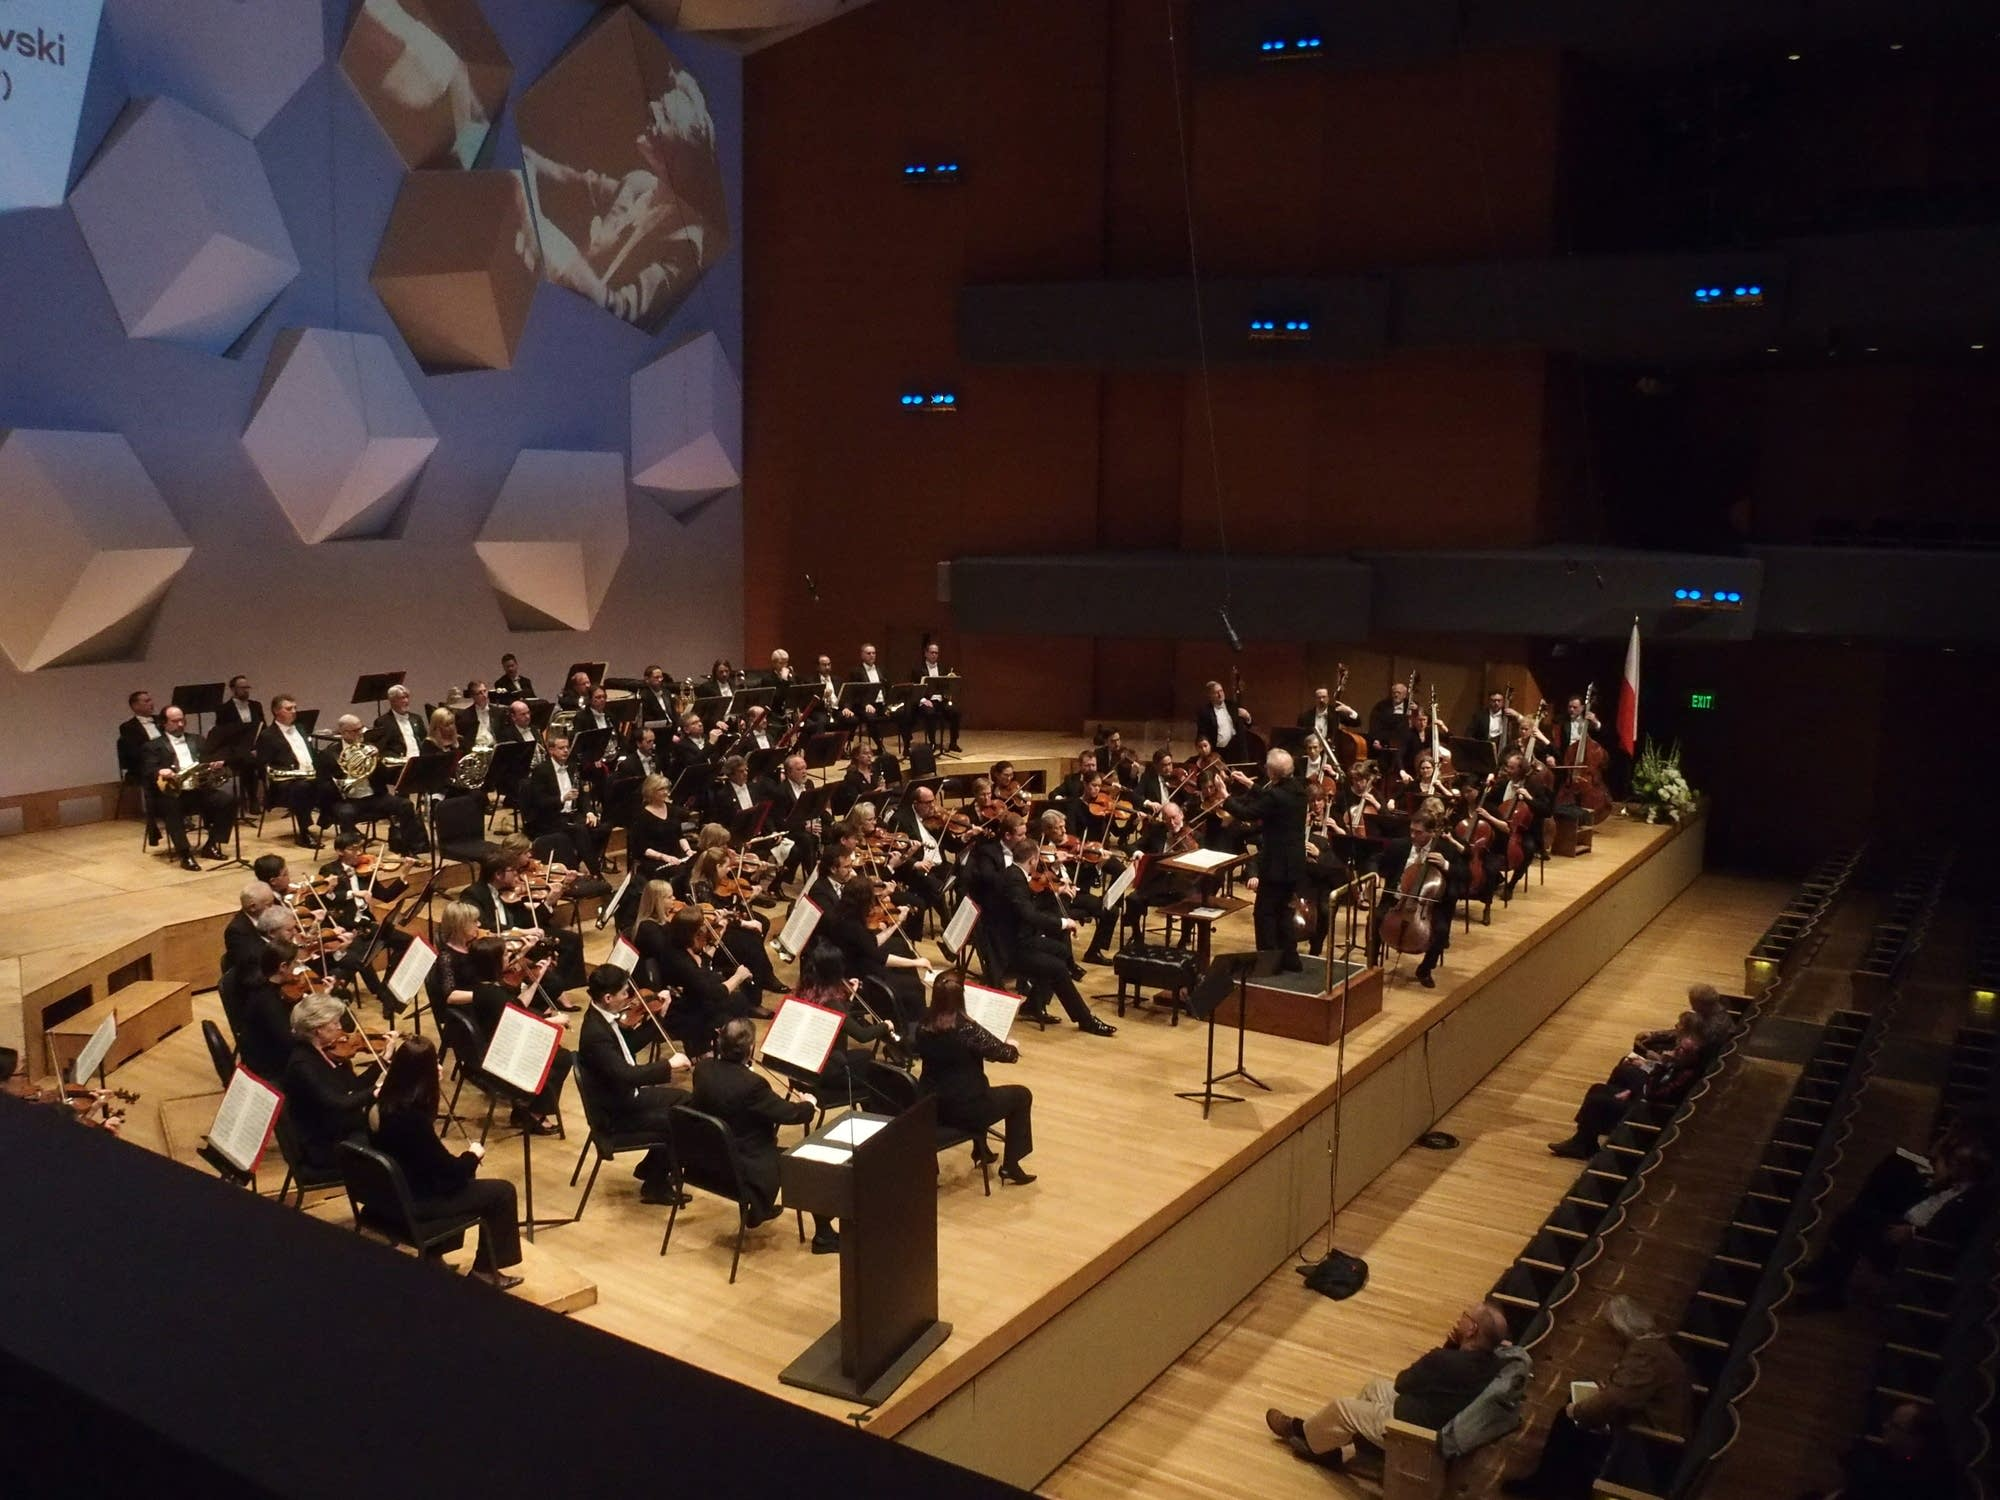 The Minnesota Orchestra performs Bruckner